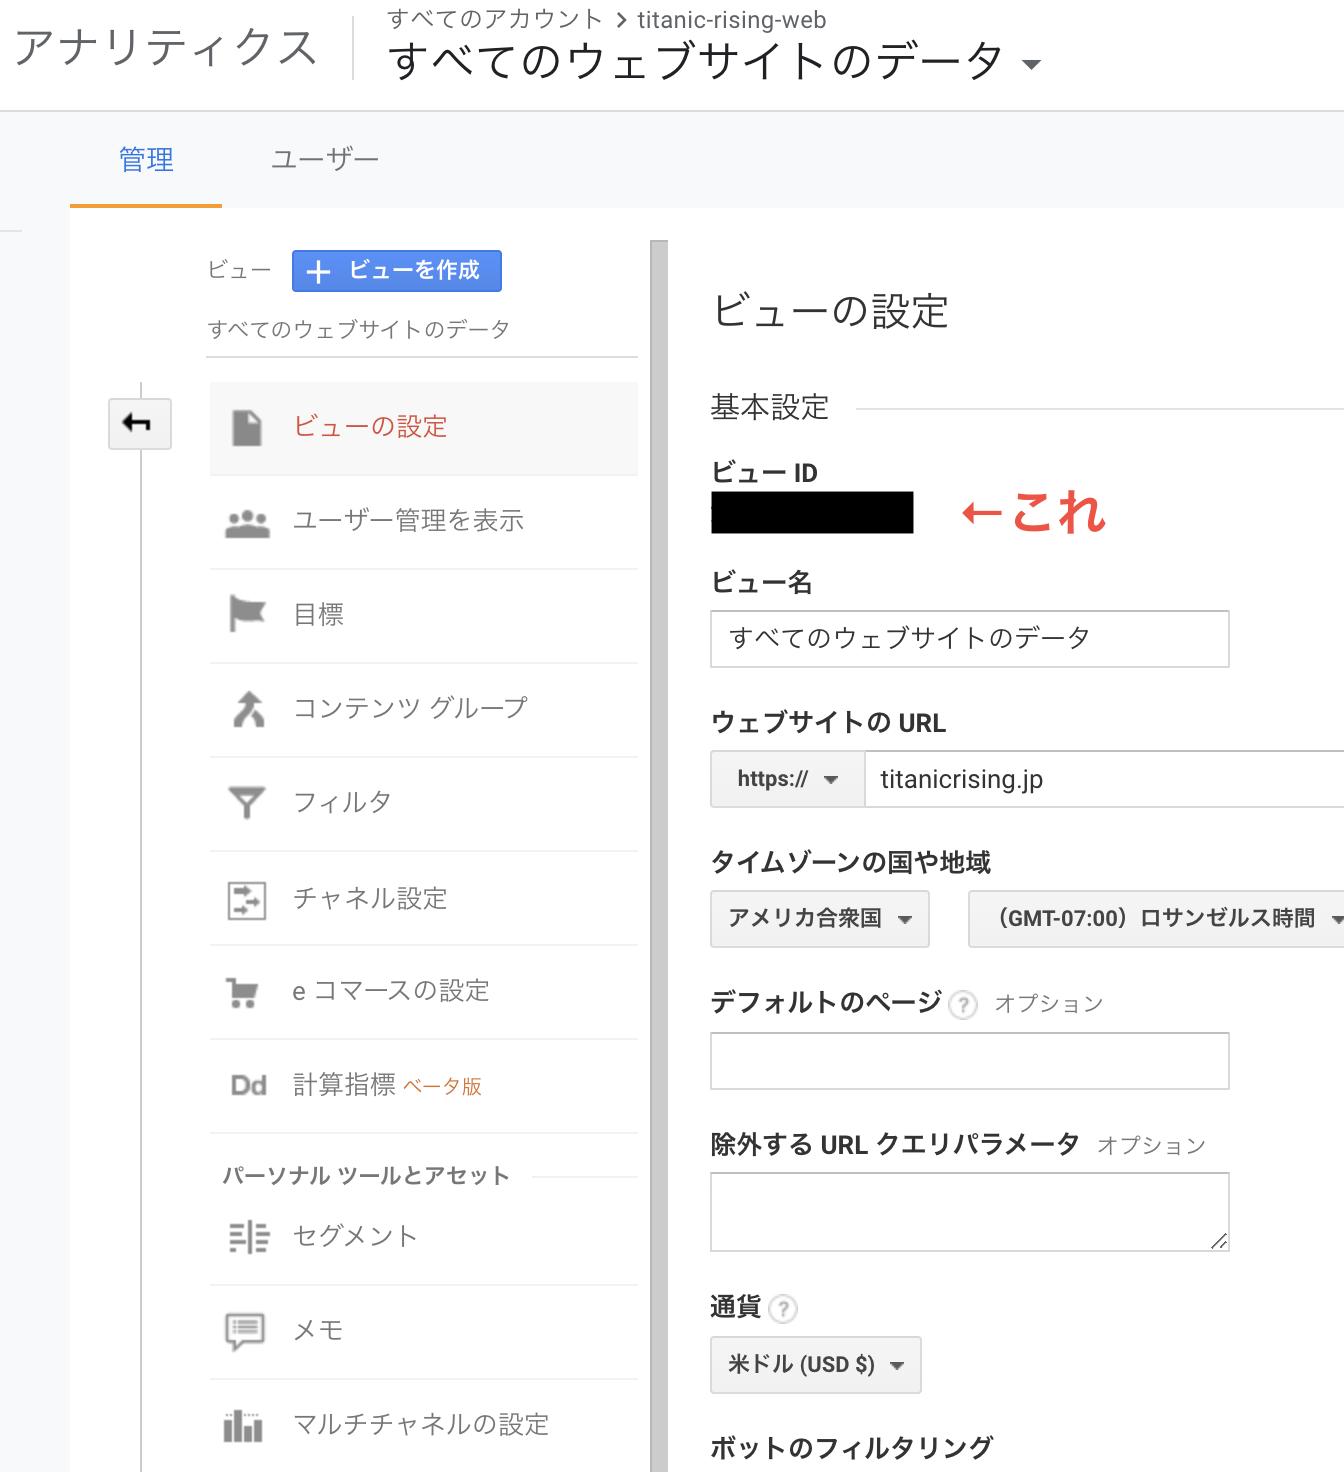 https://res.cloudinary.com/dw86z2fnr/image/upload/v1620383434/titanicrising.jp/popular-article/_2020-09-19_11.13.49_xaubek.png